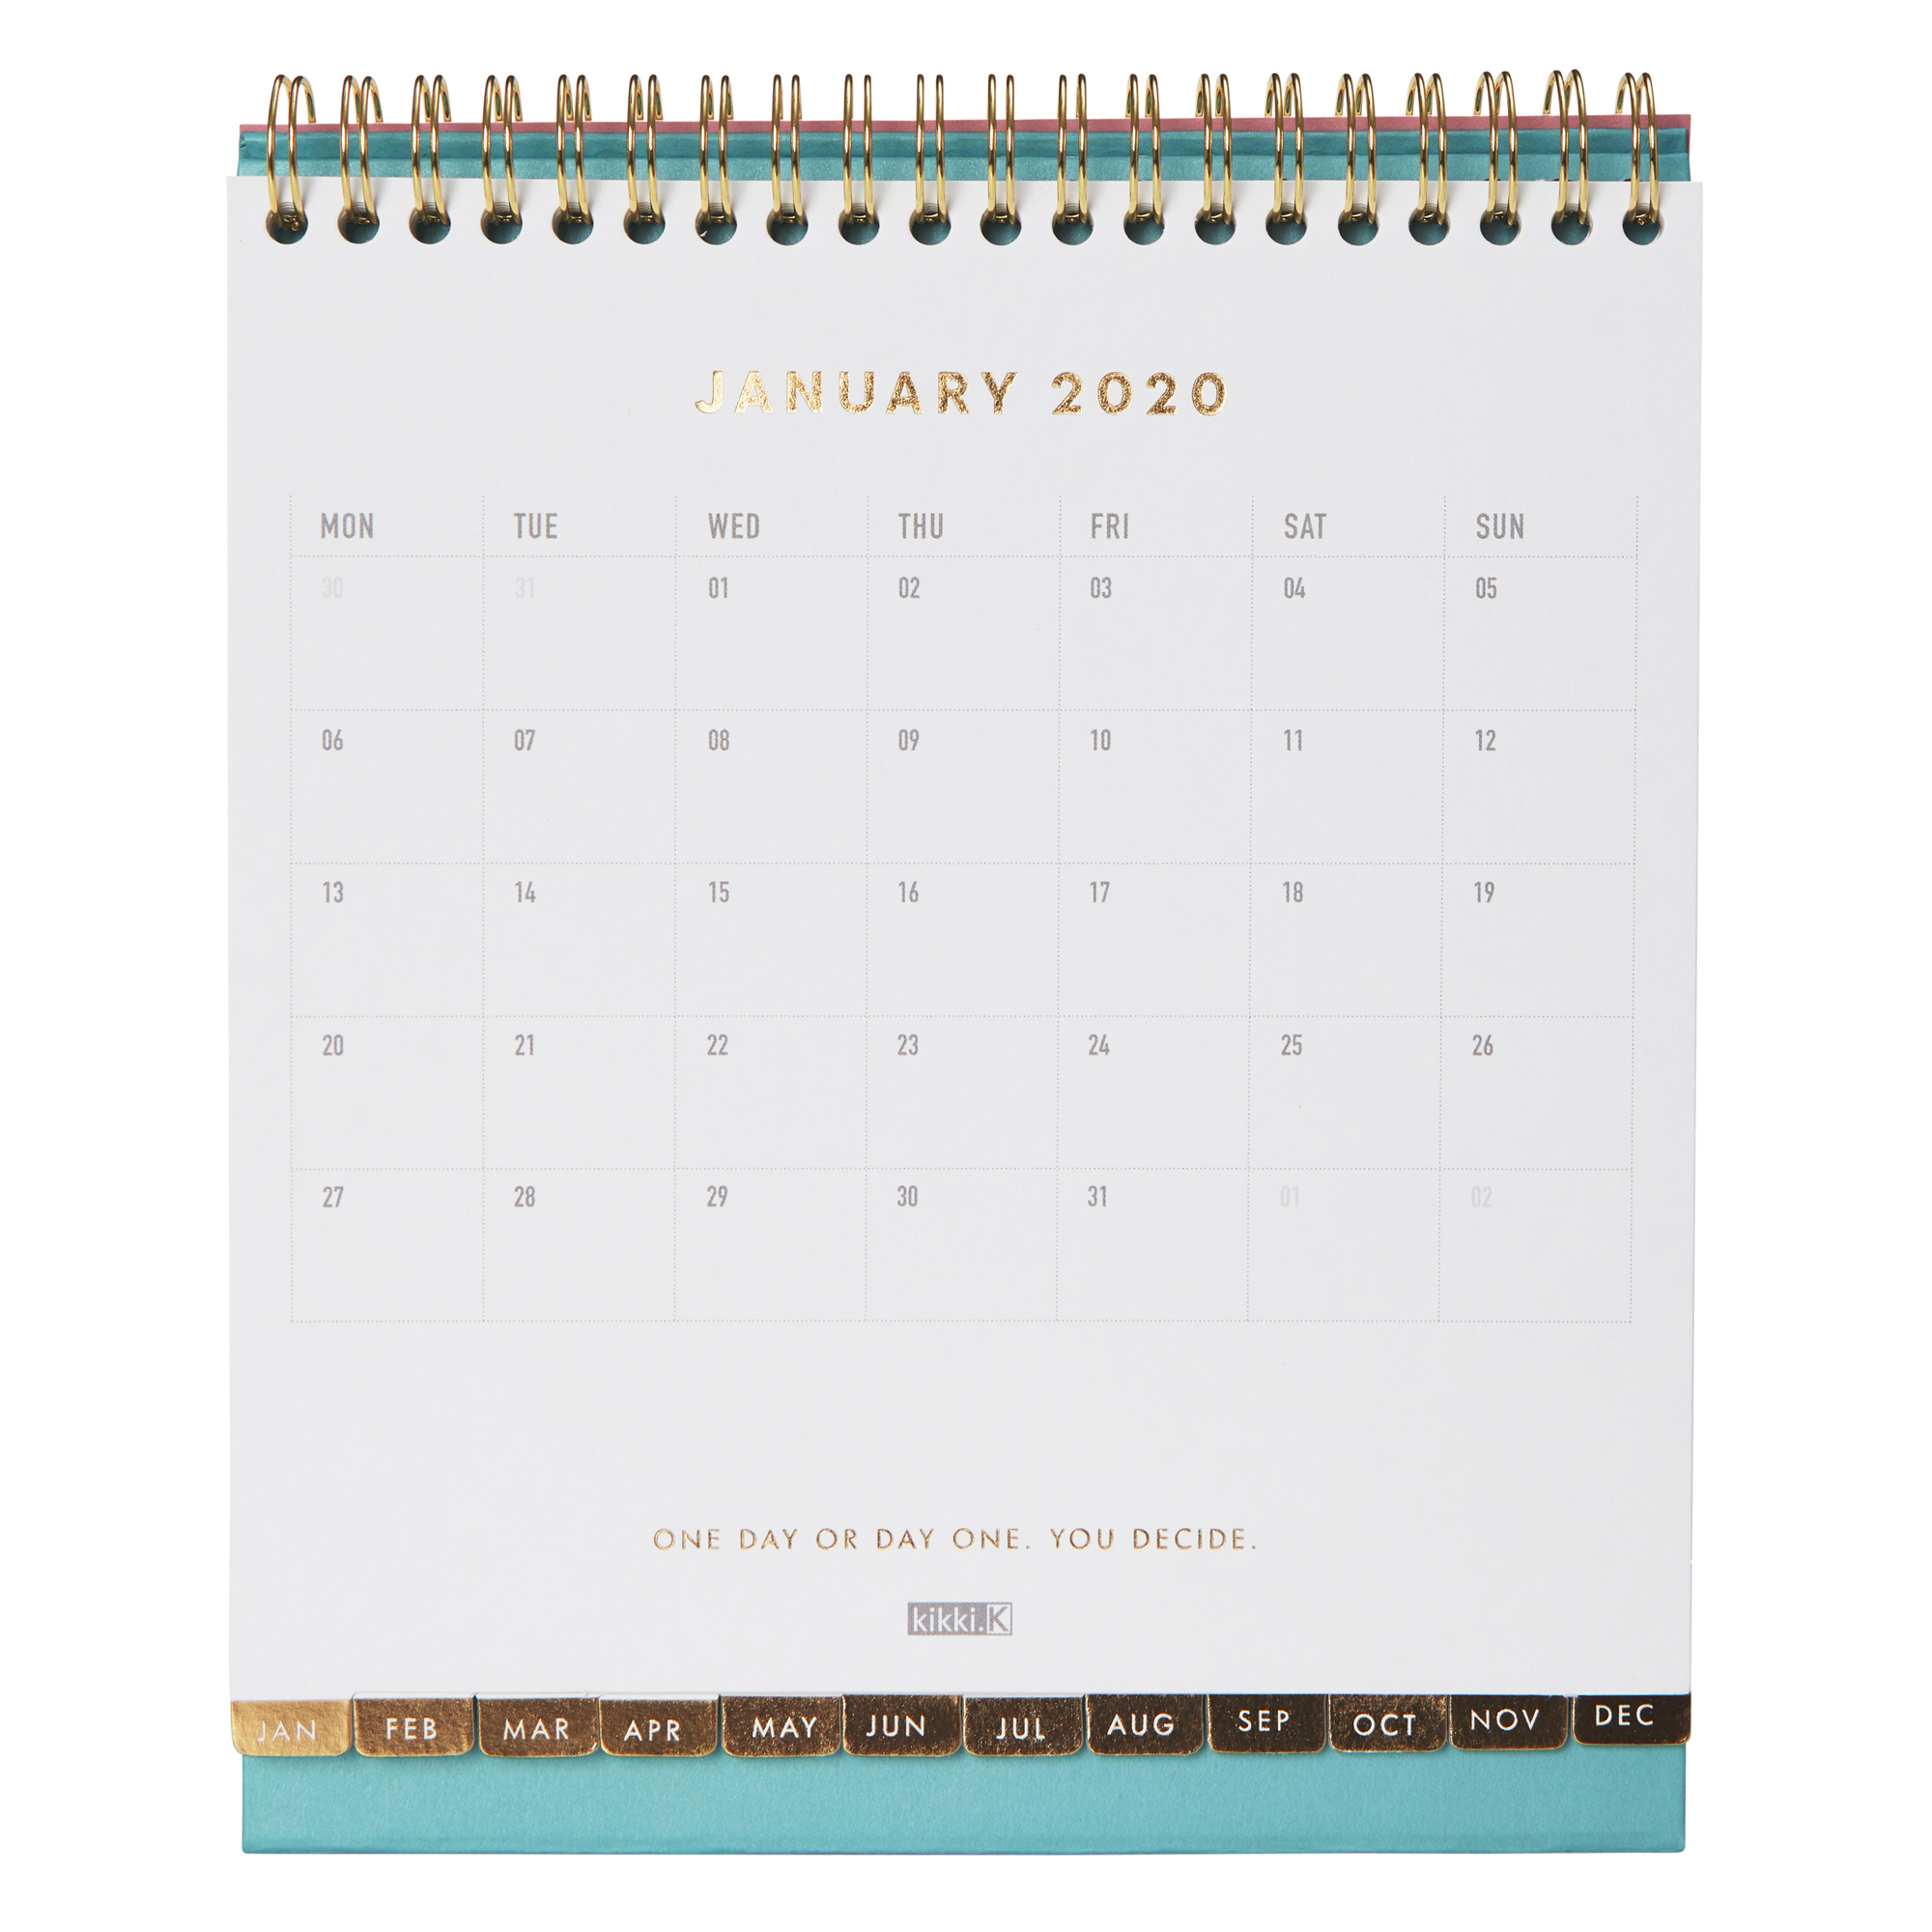 2020 Desk Calendar: Inspiration | Calendars | Kikki.k Row